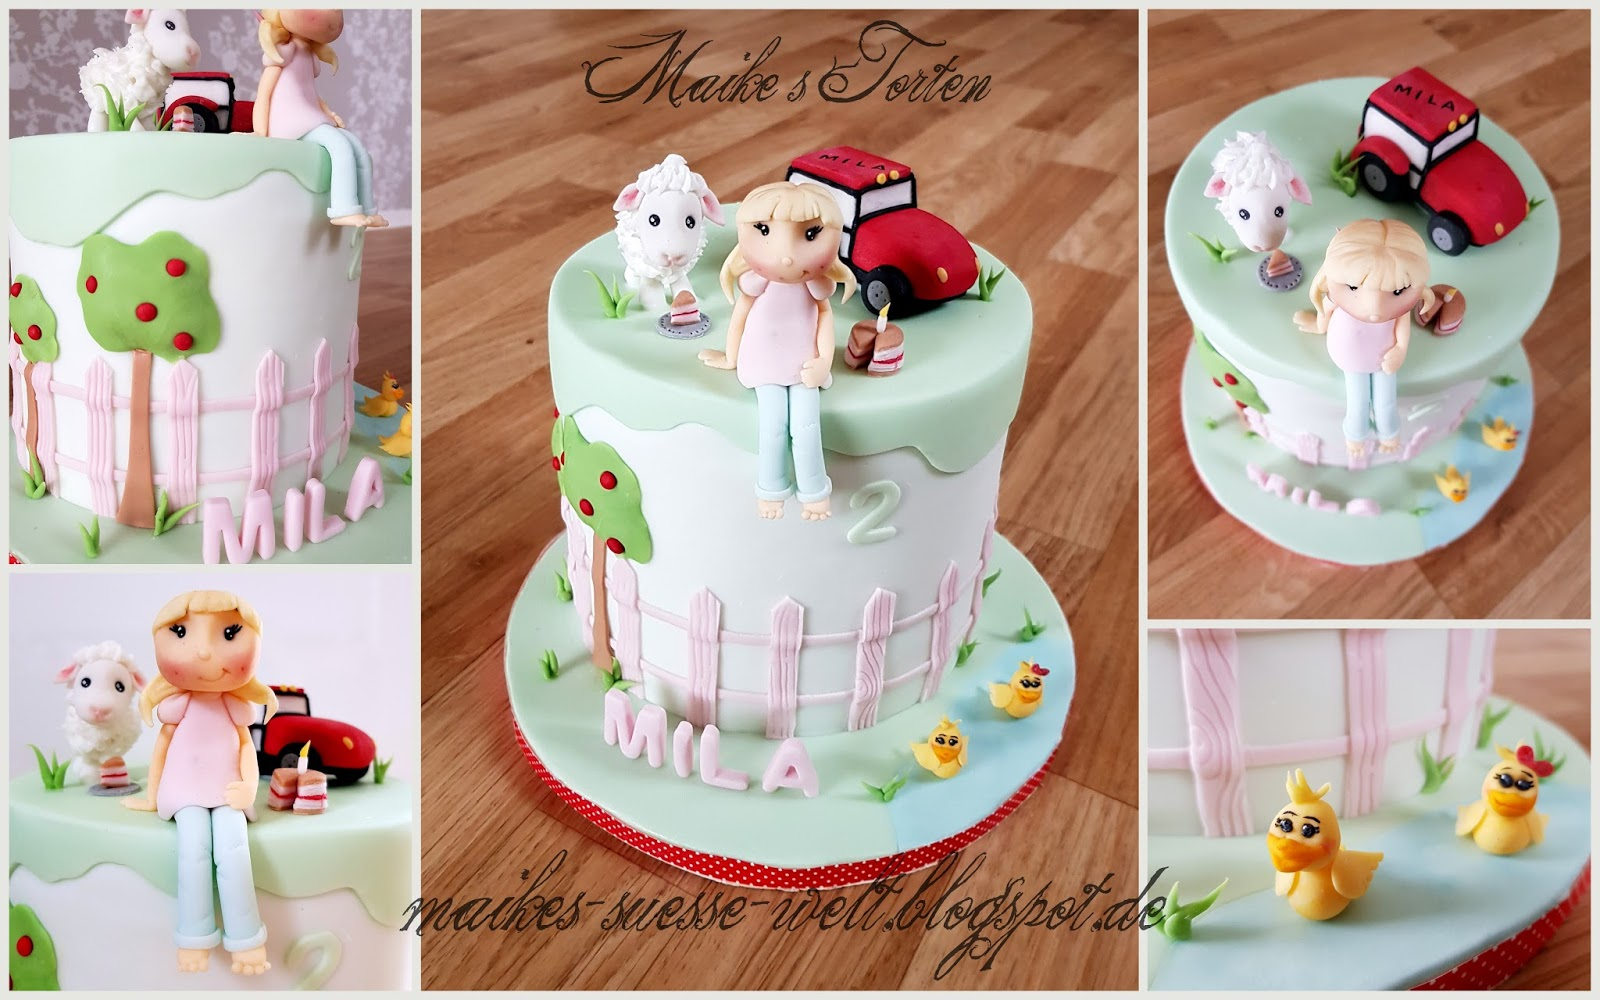 Maike´s Süße Welt: Mila´s Torte Zum 2. Geburtstag / Rezept bei Torte Zum 2 Geburtstag